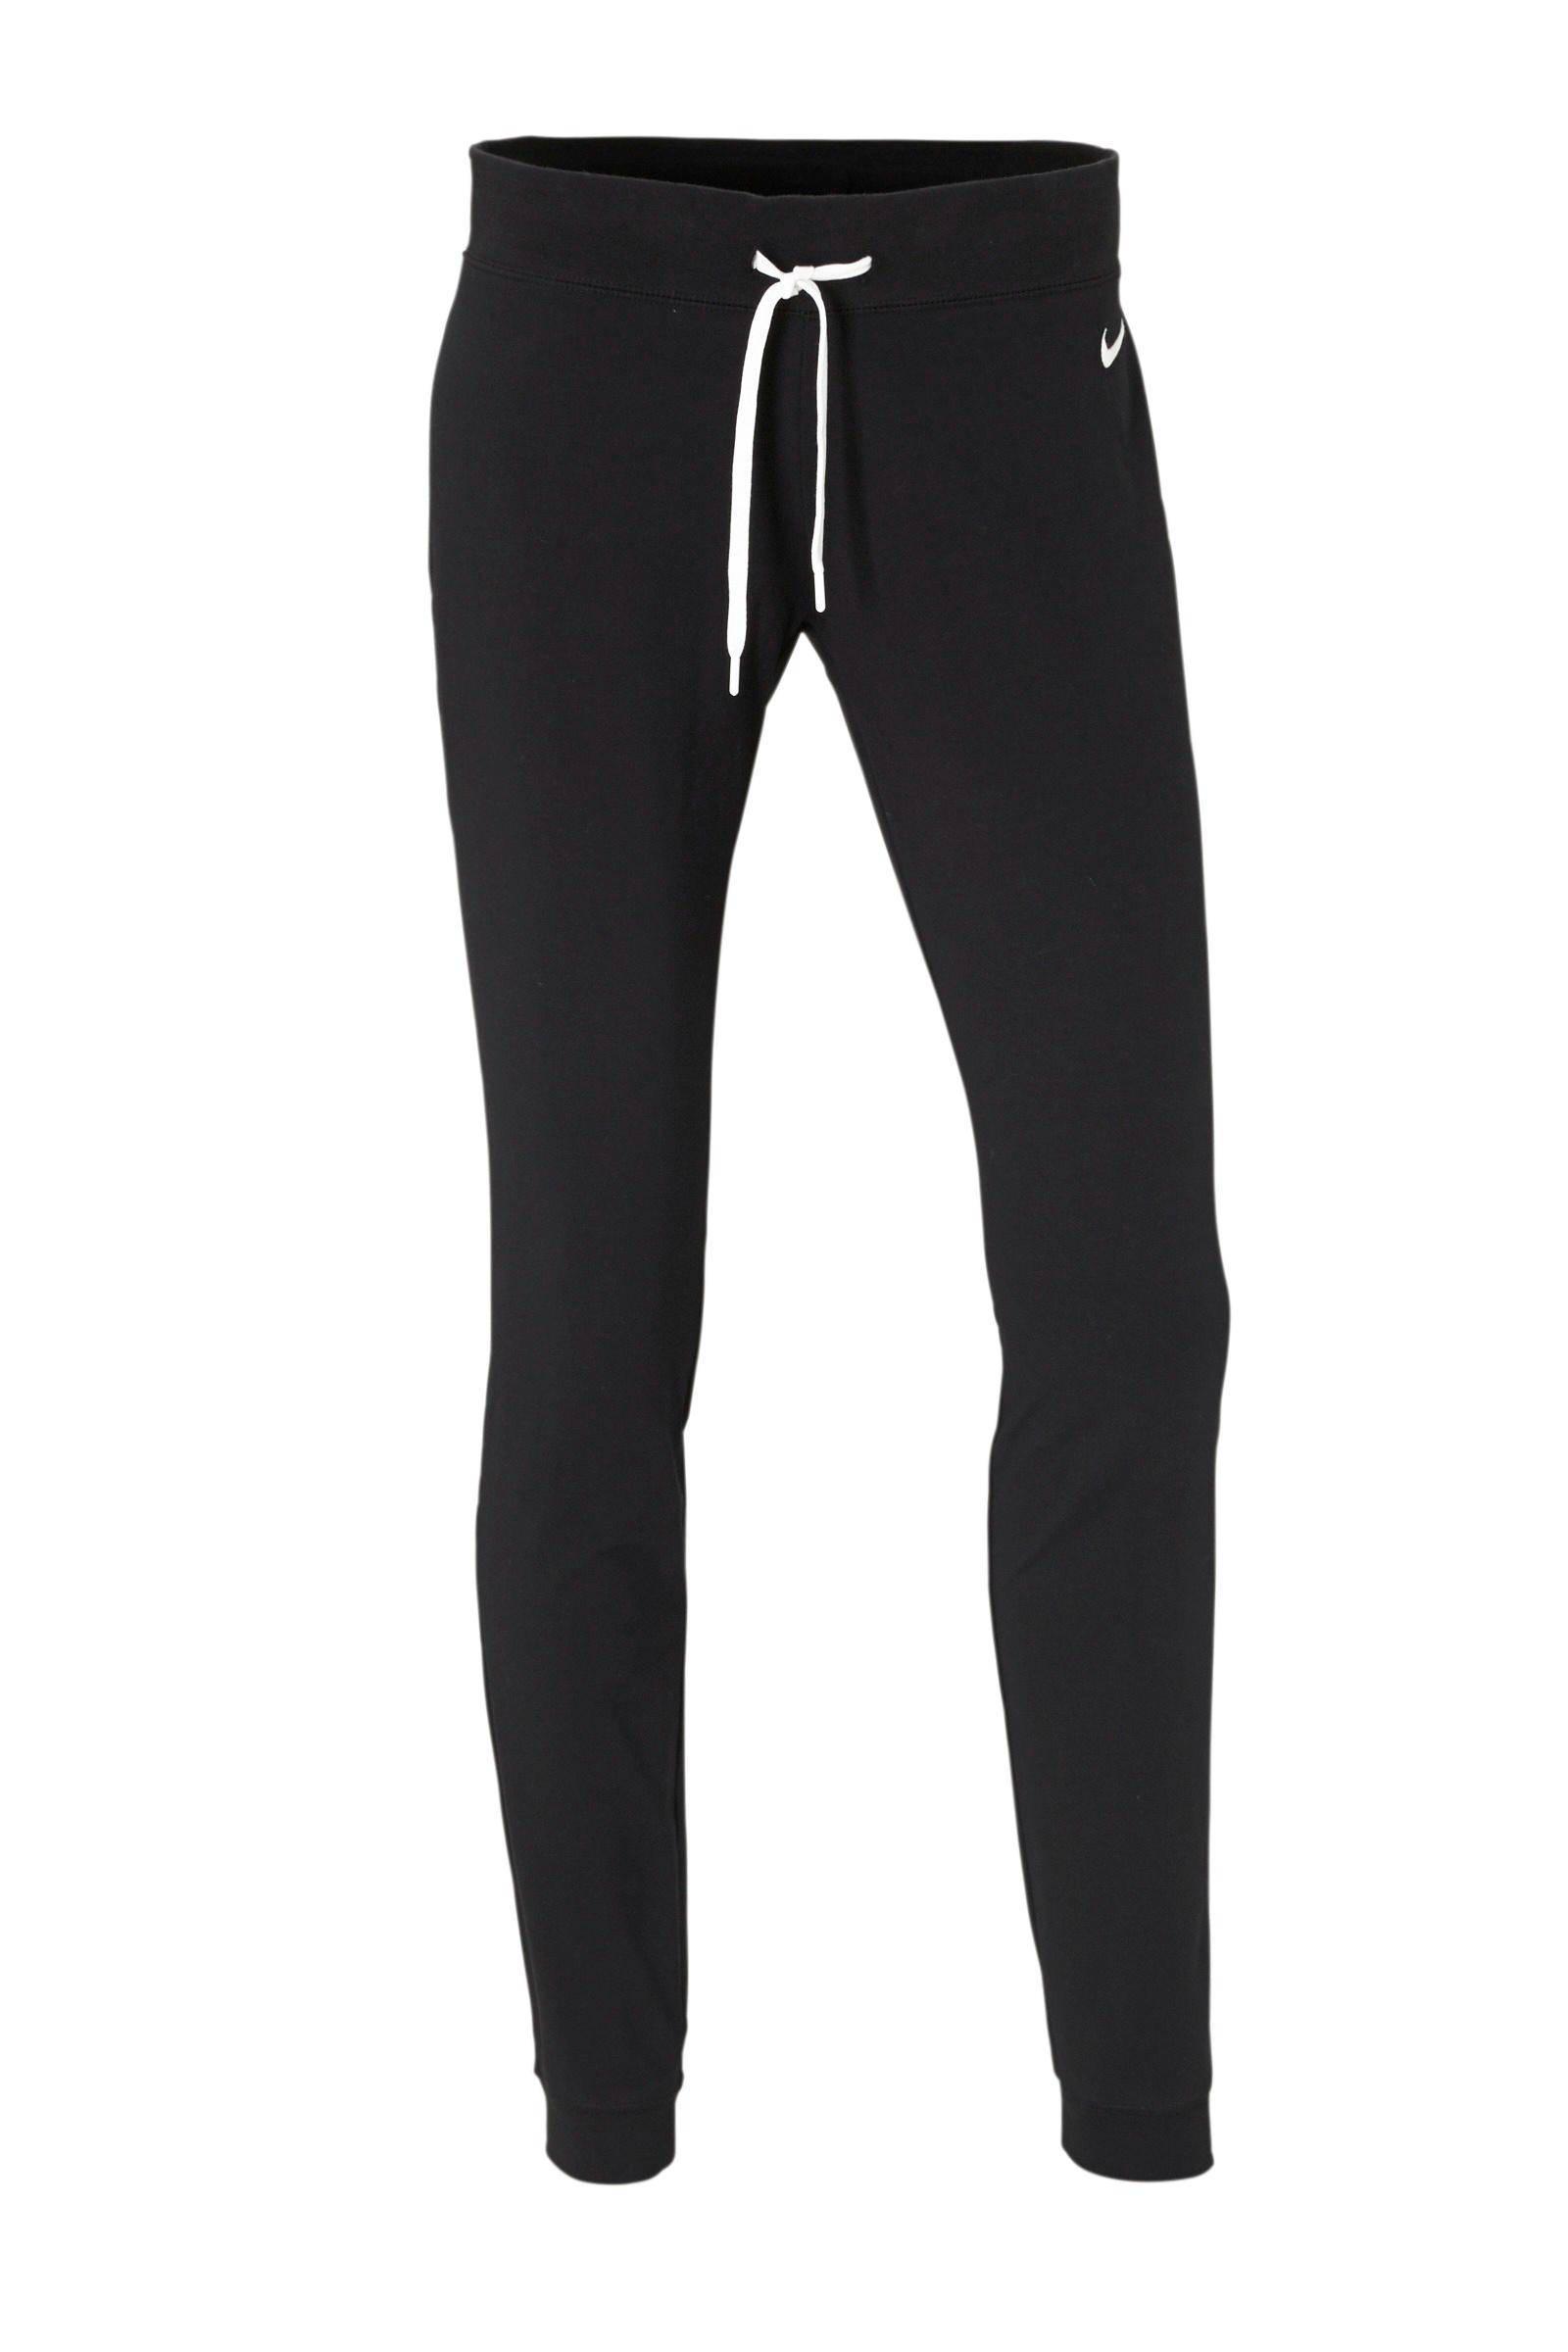 Joggingbroek Zwart Dames.Nike Joggingbroek Wehkamp